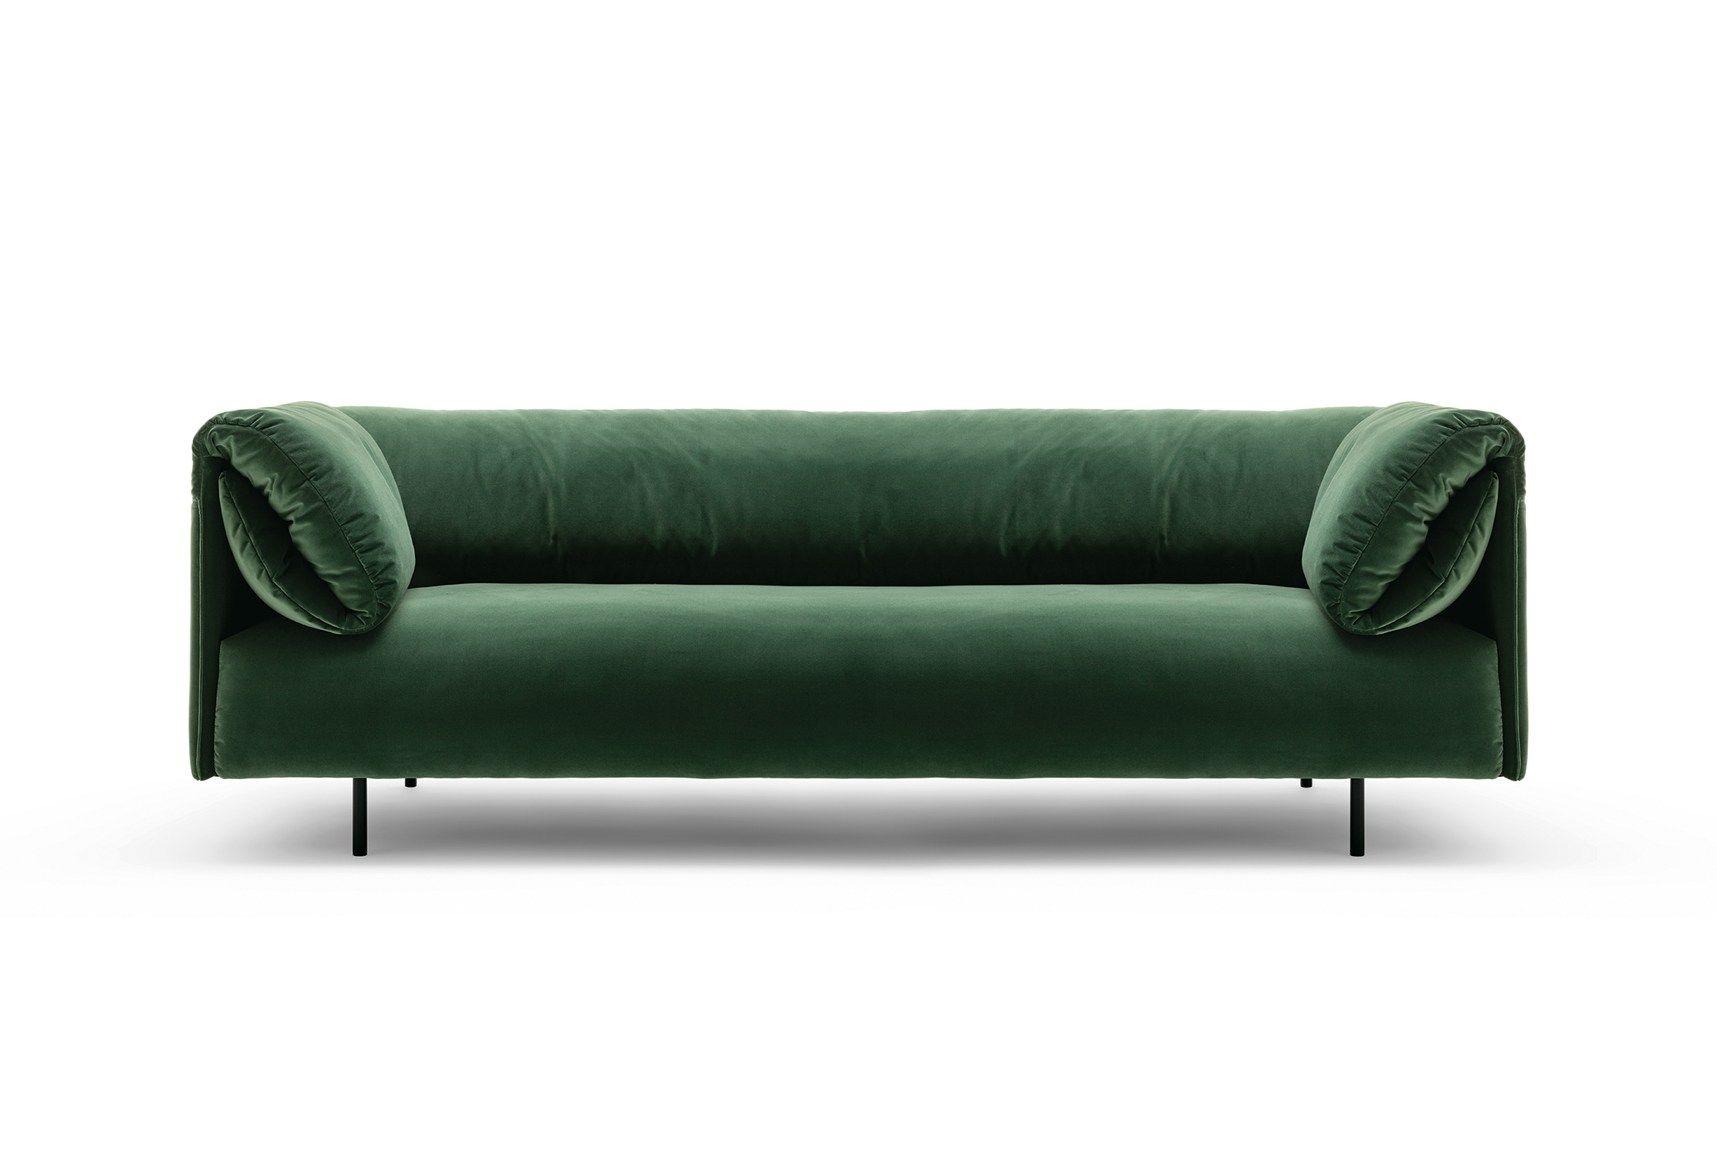 comfortable rolf benz sofa. Comfortable Rolf Benz Sofa